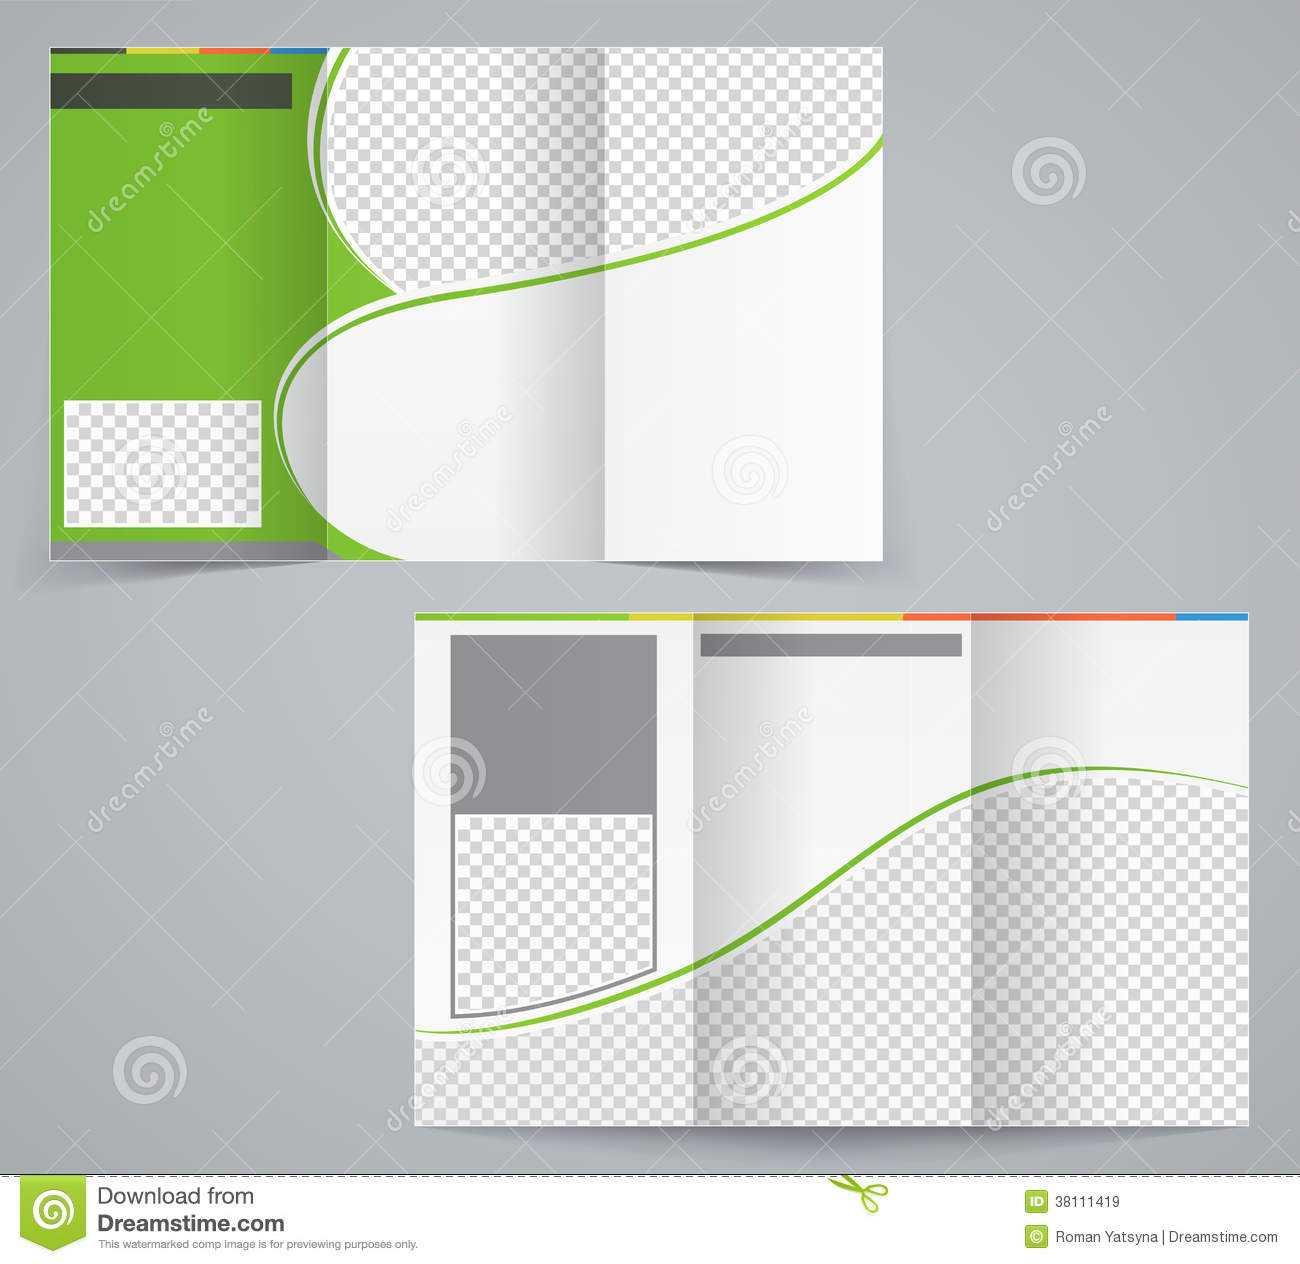 Tri-Fold Business Brochure Template, Vector Green Stock intended for Tri Fold Brochure Template Illustrator